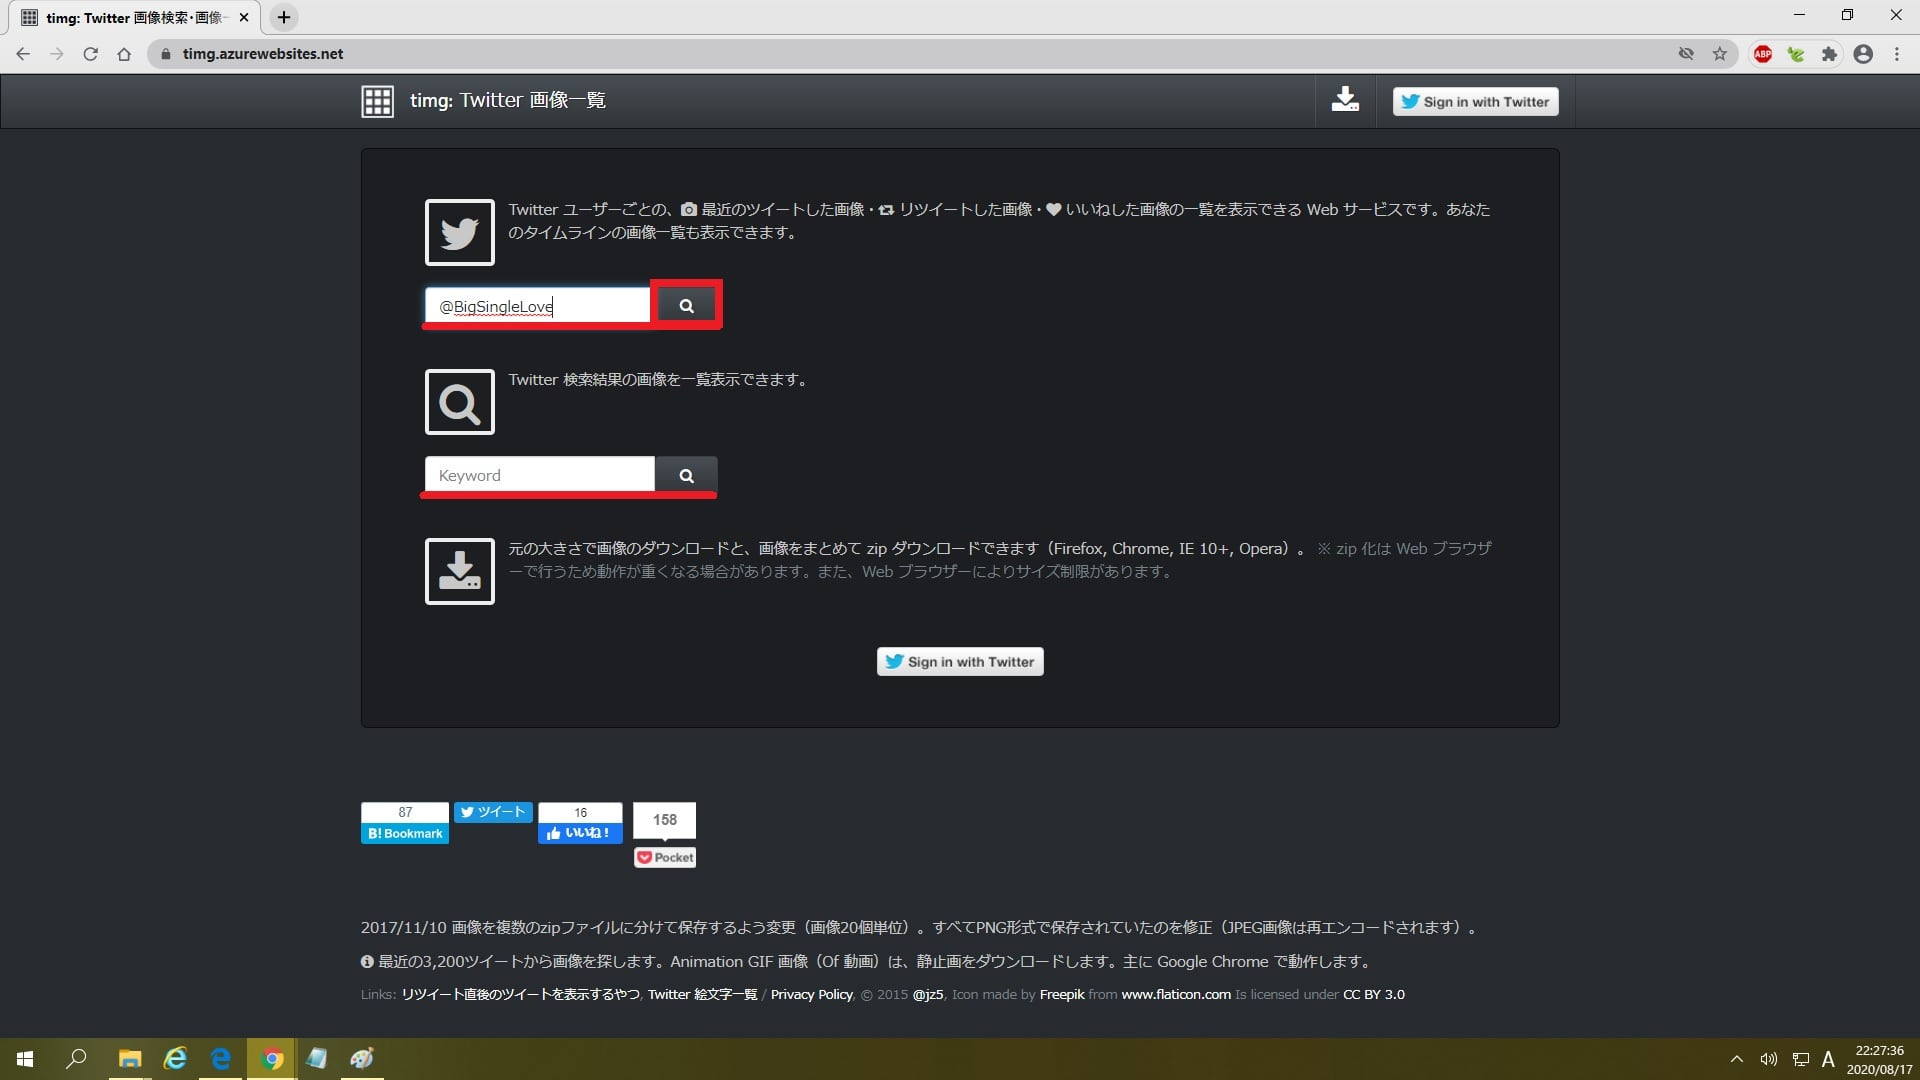 Twitter 動画 bl